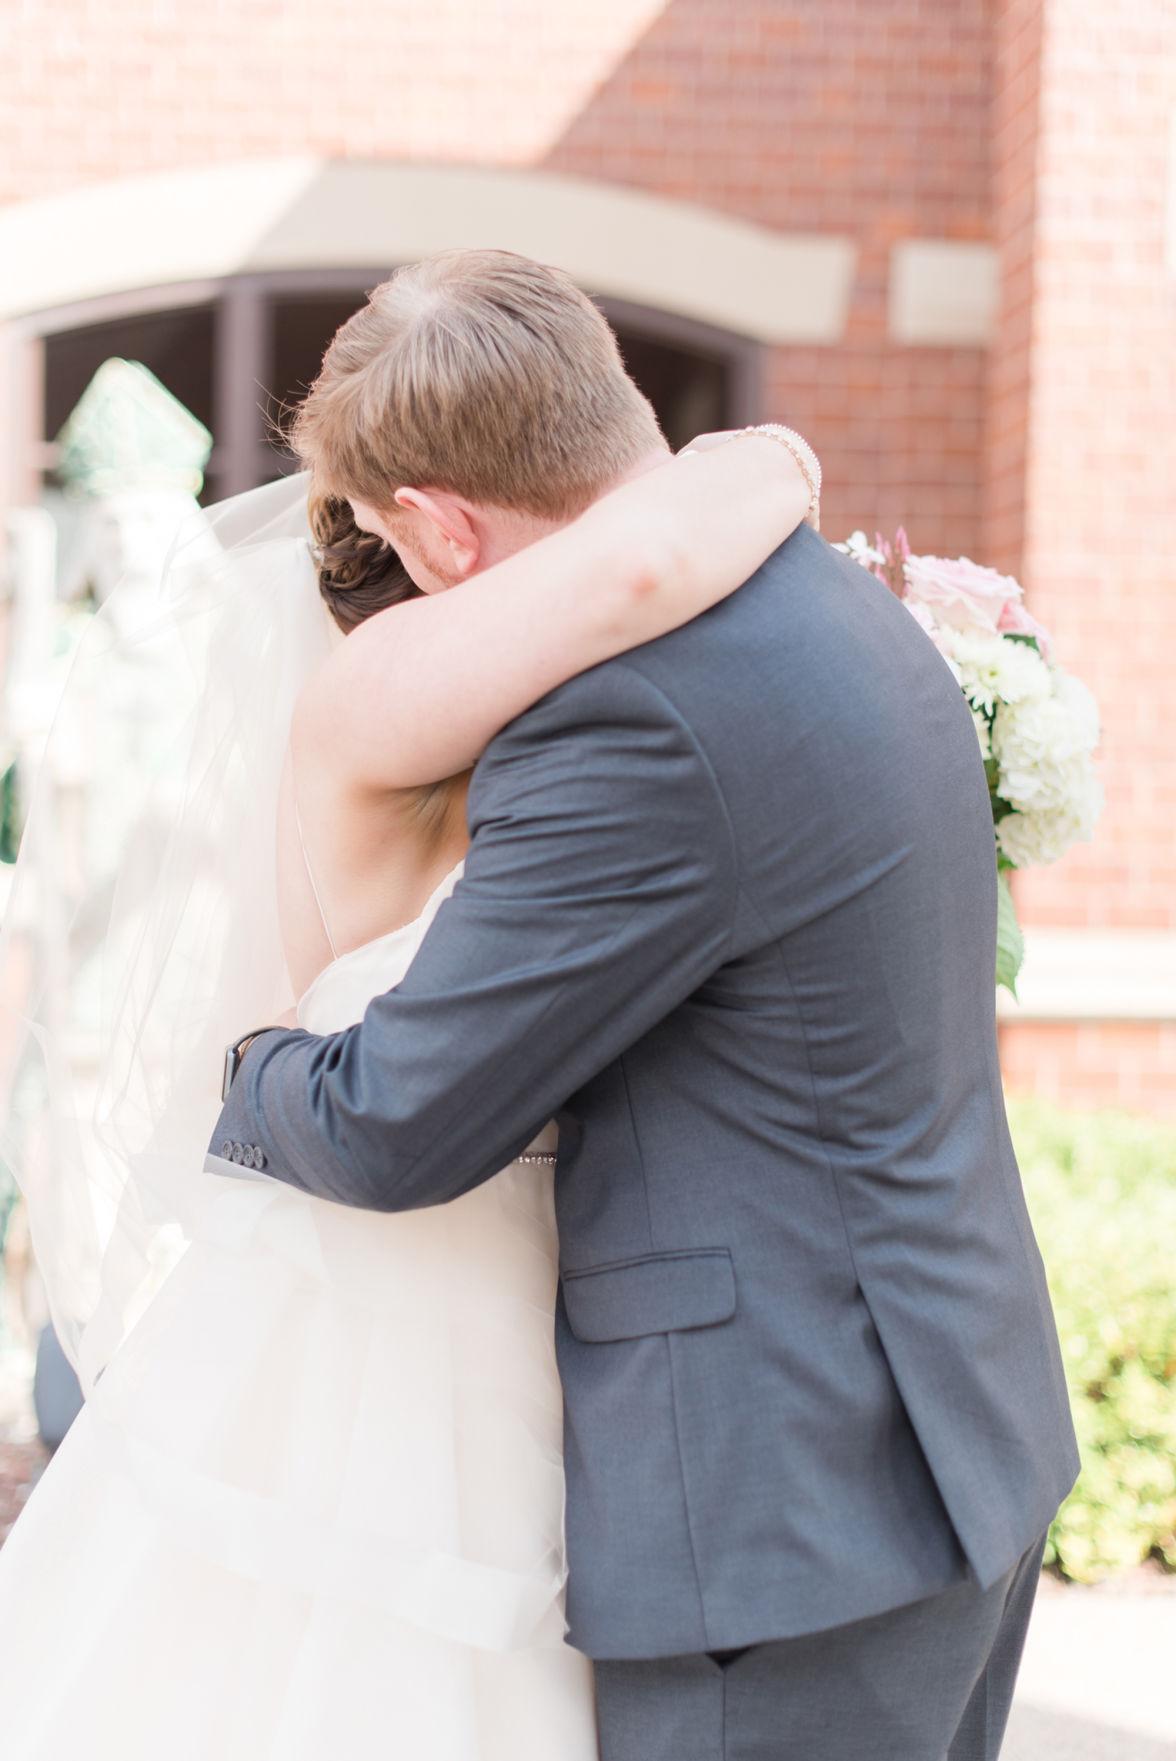 Blush Spring Omaha Wedding Essentials Popcorn On Pinterest Short Circuit 2 The Princess Bride And Movies Planning Information Brides